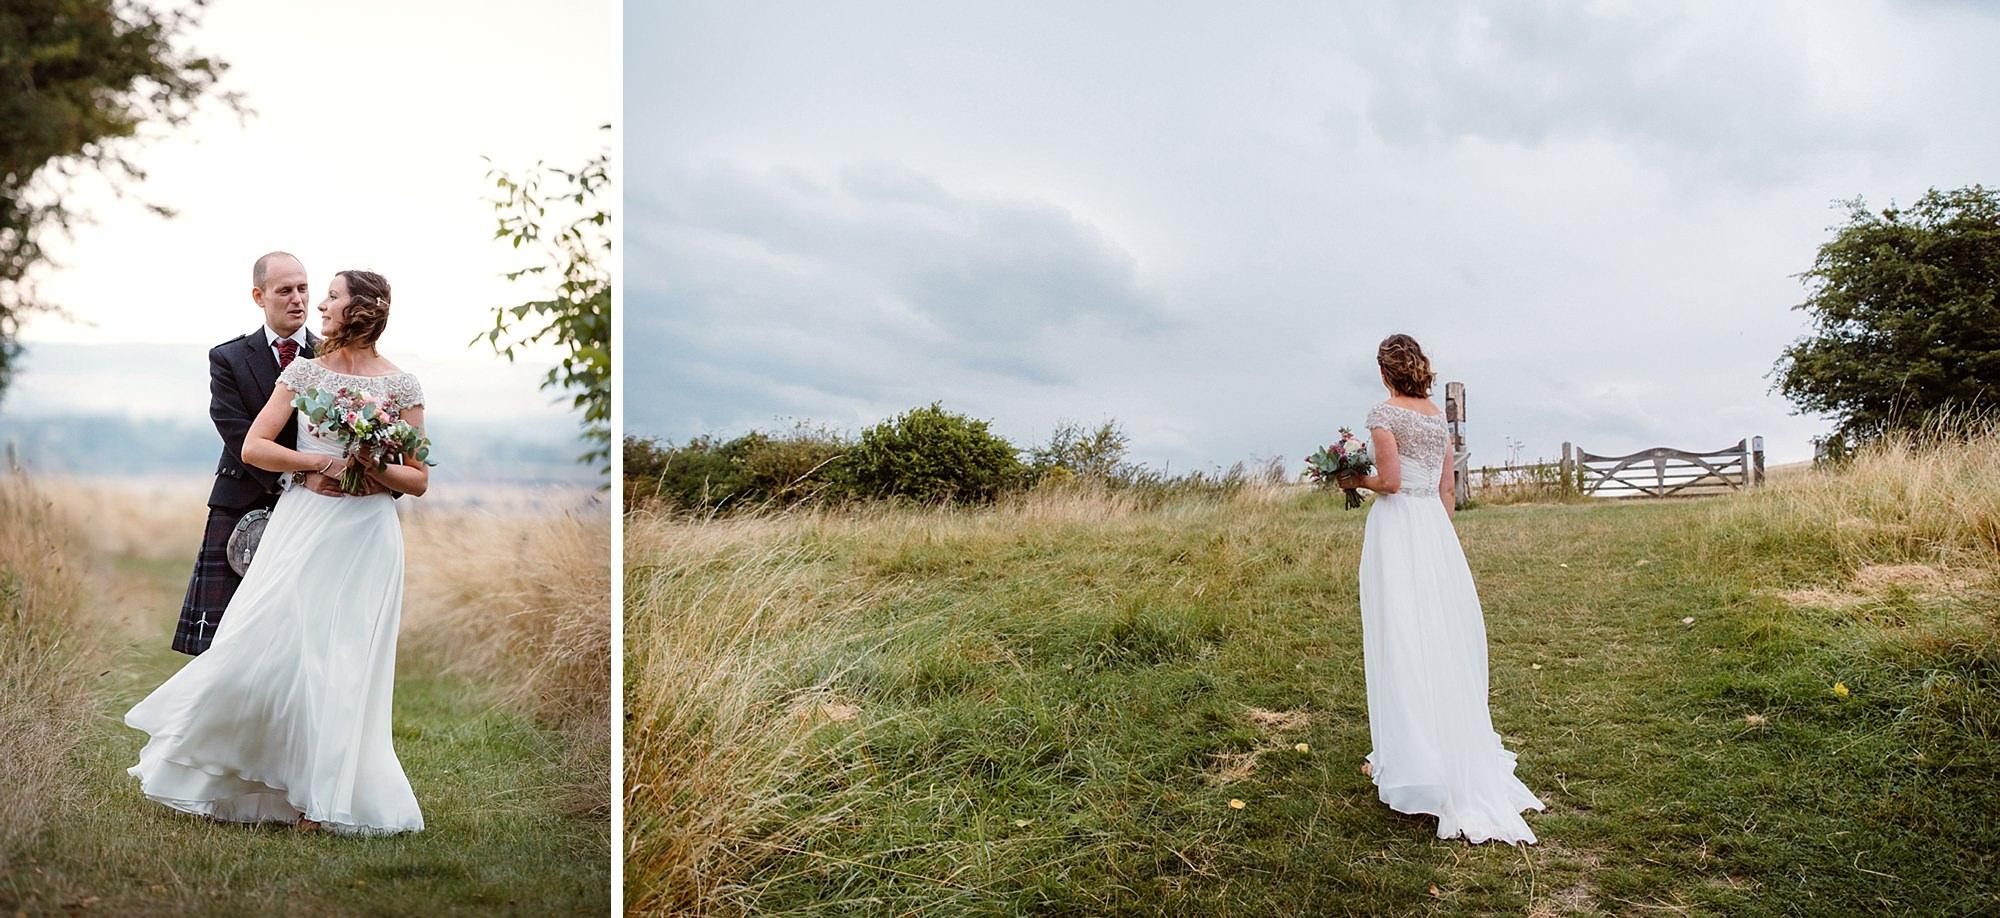 outdoor humanist wedding photography bride and groom